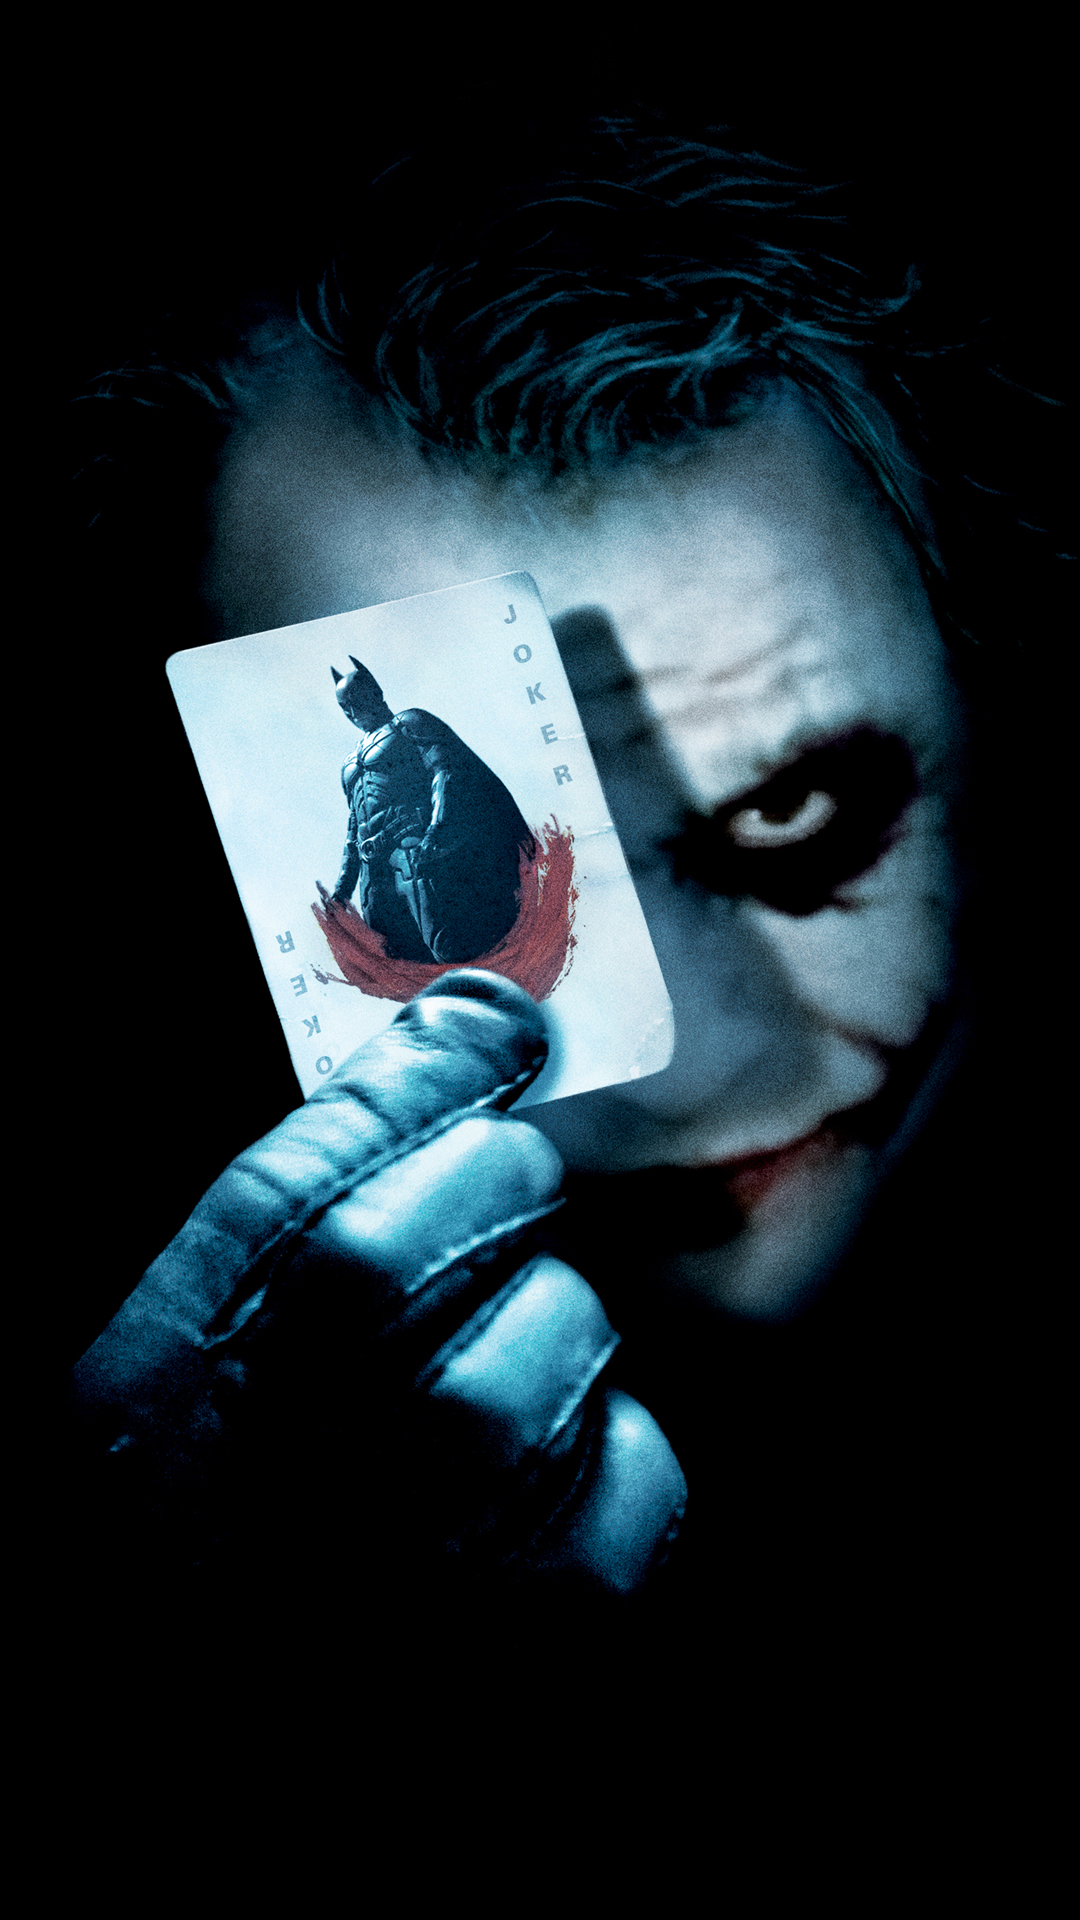 Wallpaper download joker - Wallpaper Download Joker 35